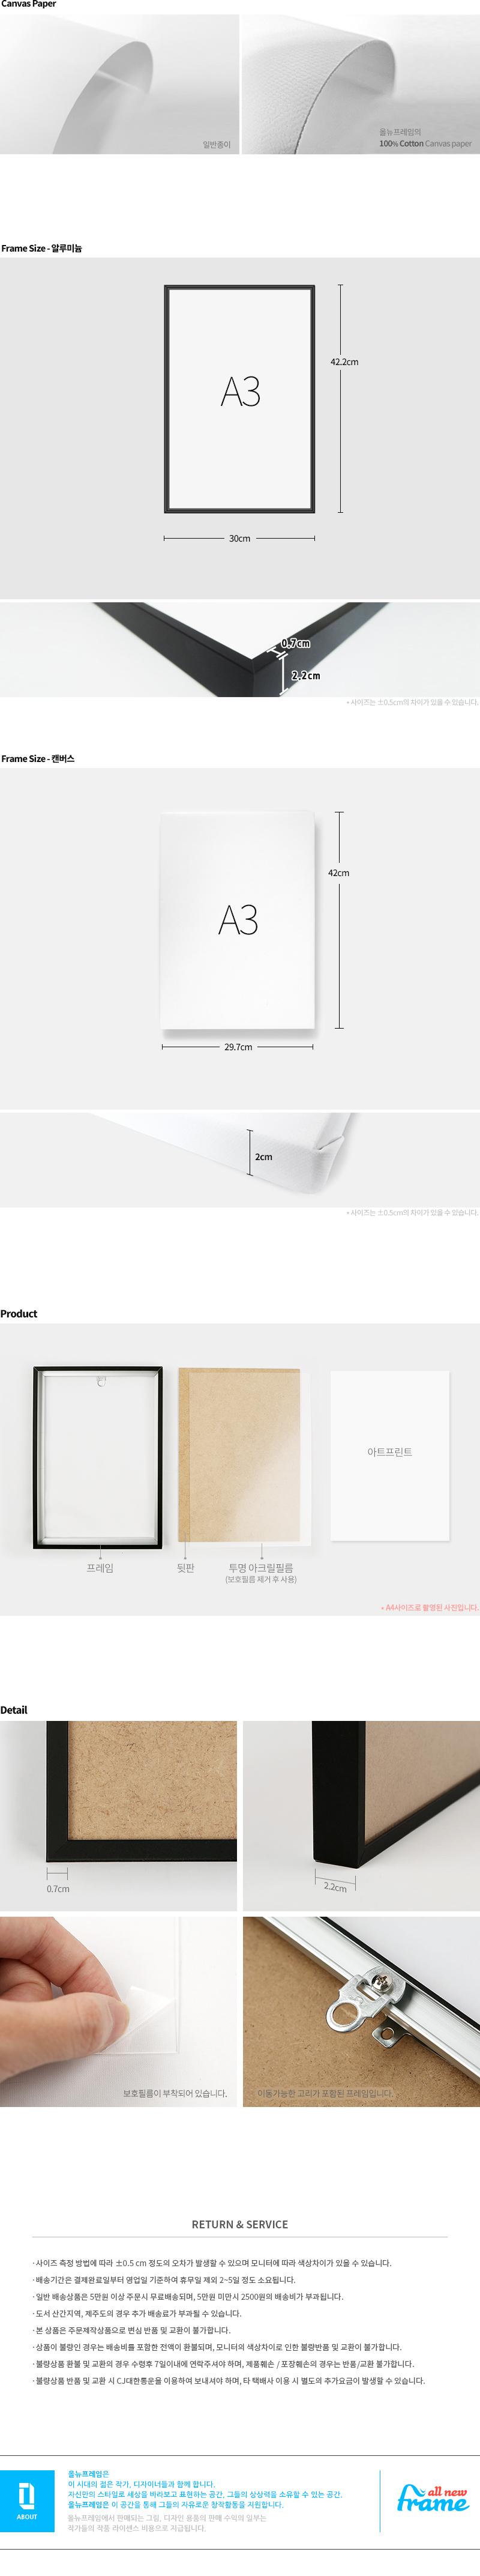 LIVE YOUR DREAM- 일러스트 액자 - 올뉴프레임, 55,000원, 홈갤러리, 캔버스아트